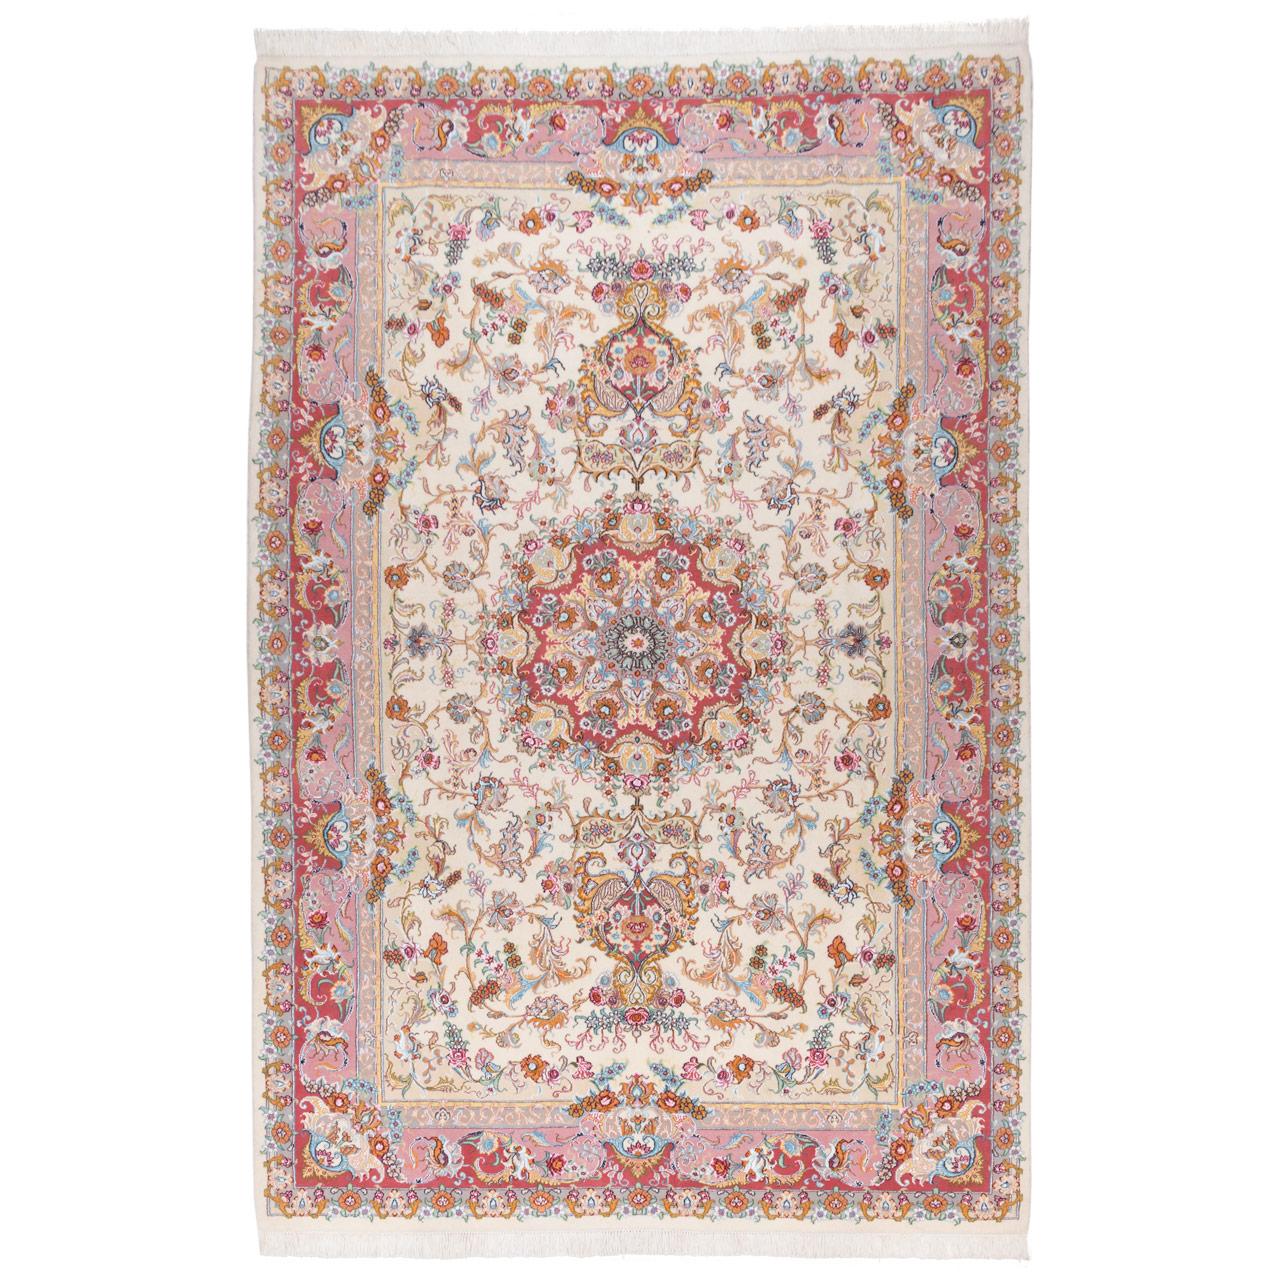 فرش دستباف شش متری سی پرشیا کد 170018